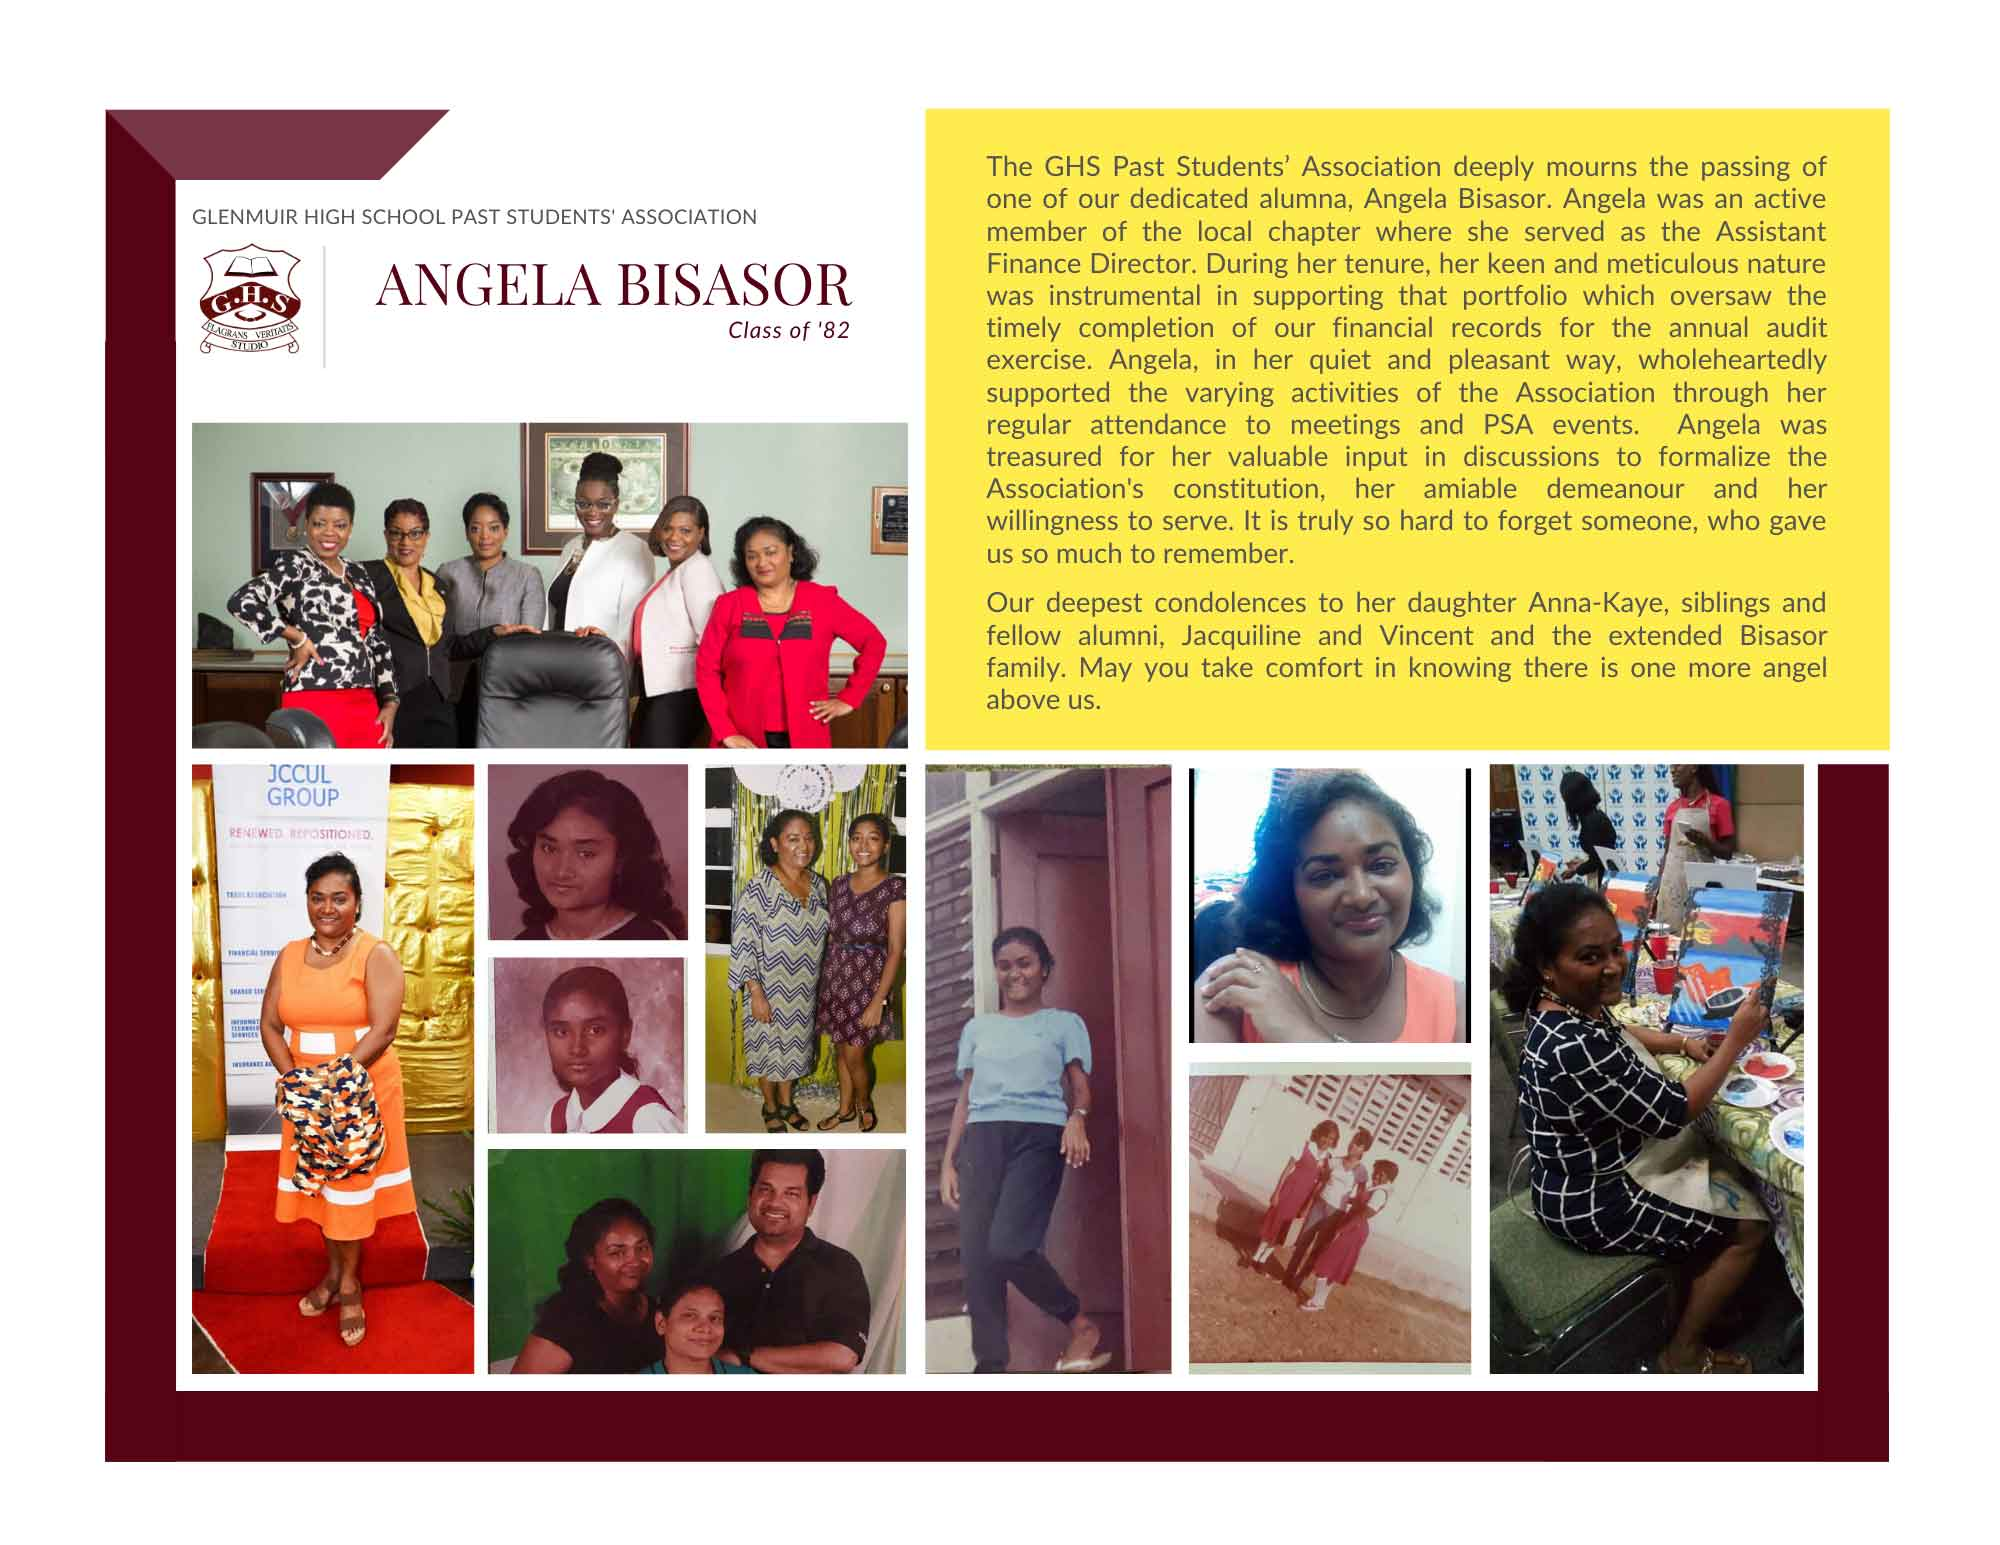 RIP Angela Bisasor